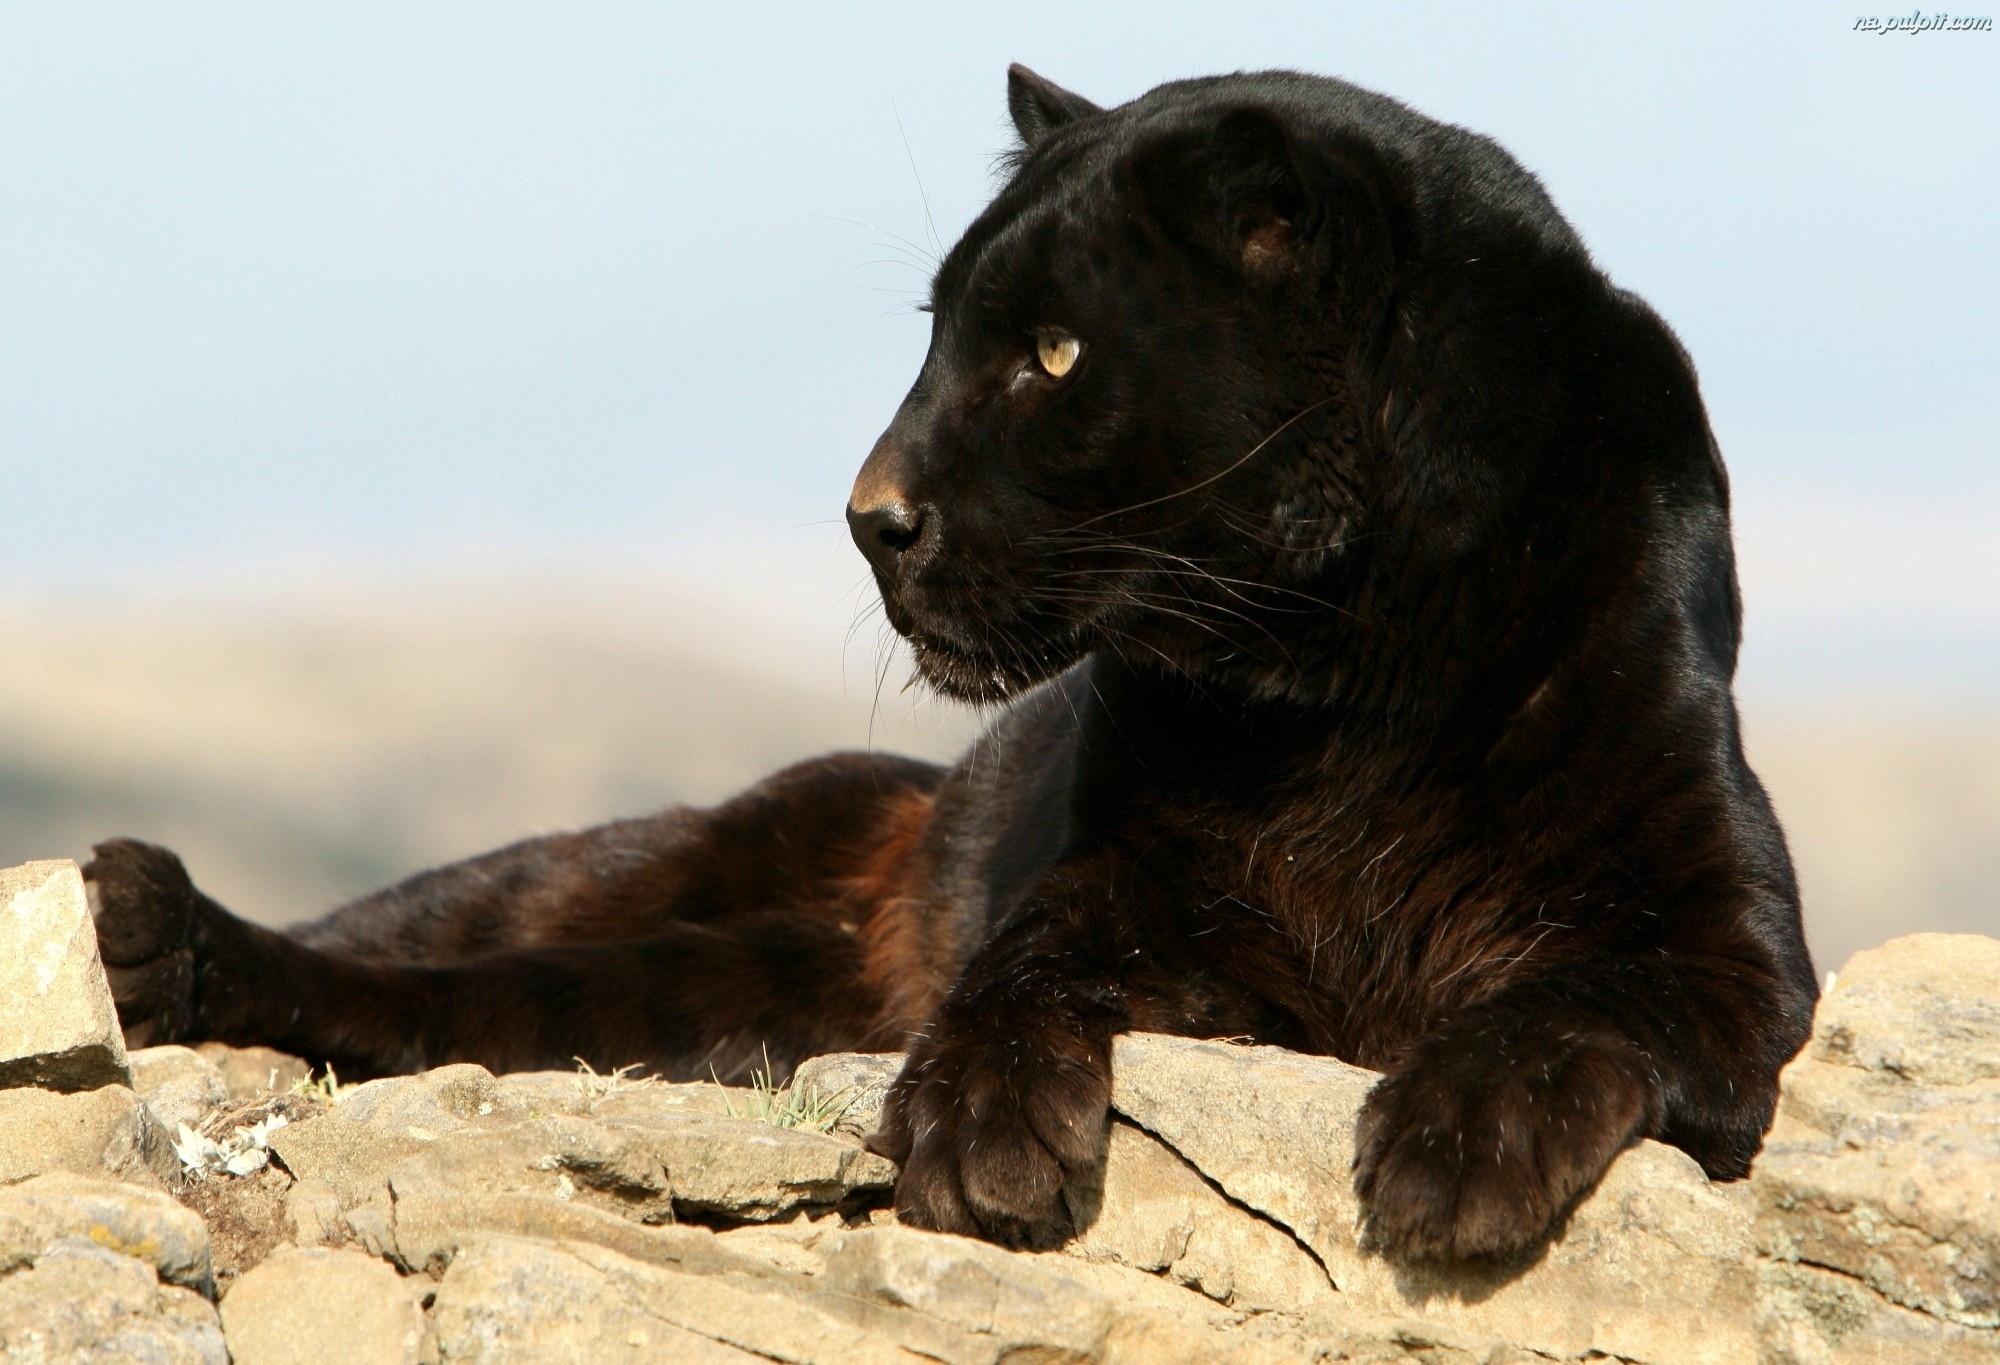 African Black Leopard | The Parody Wiki | FANDOM powered ... - photo#17